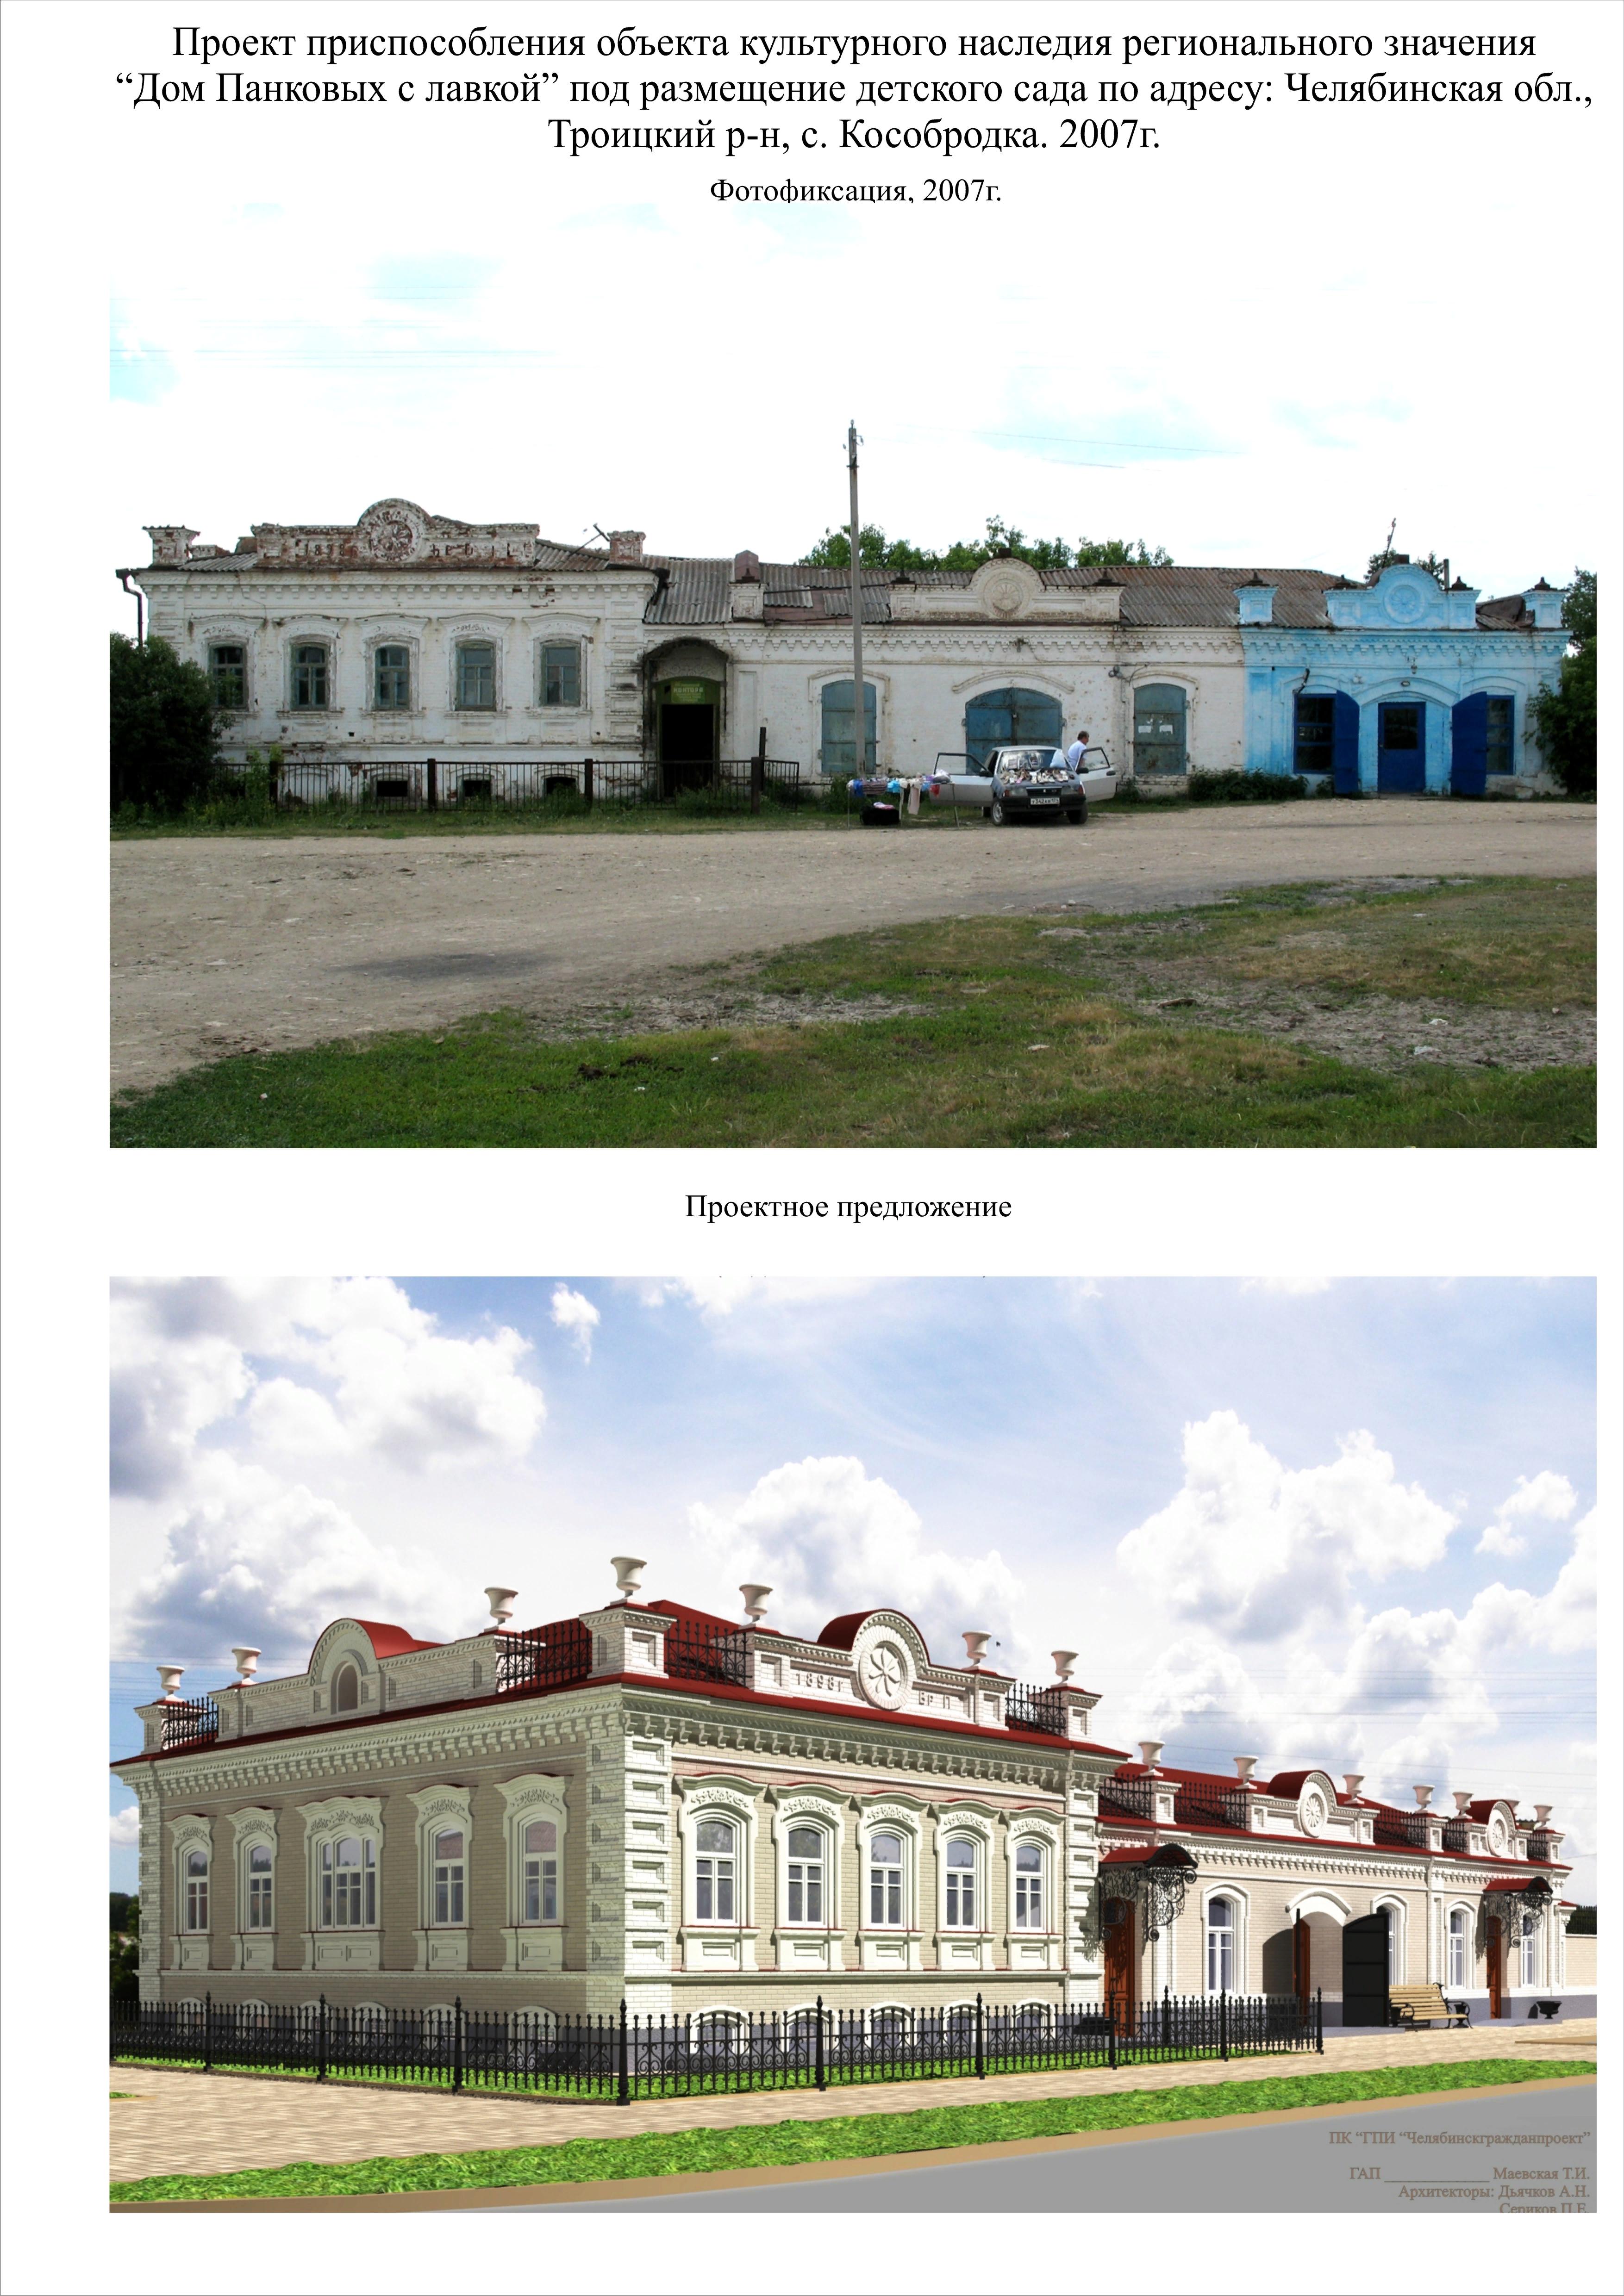 Источник: http://www.chgrp.ru/portfolio/прб/dom_pankivyh